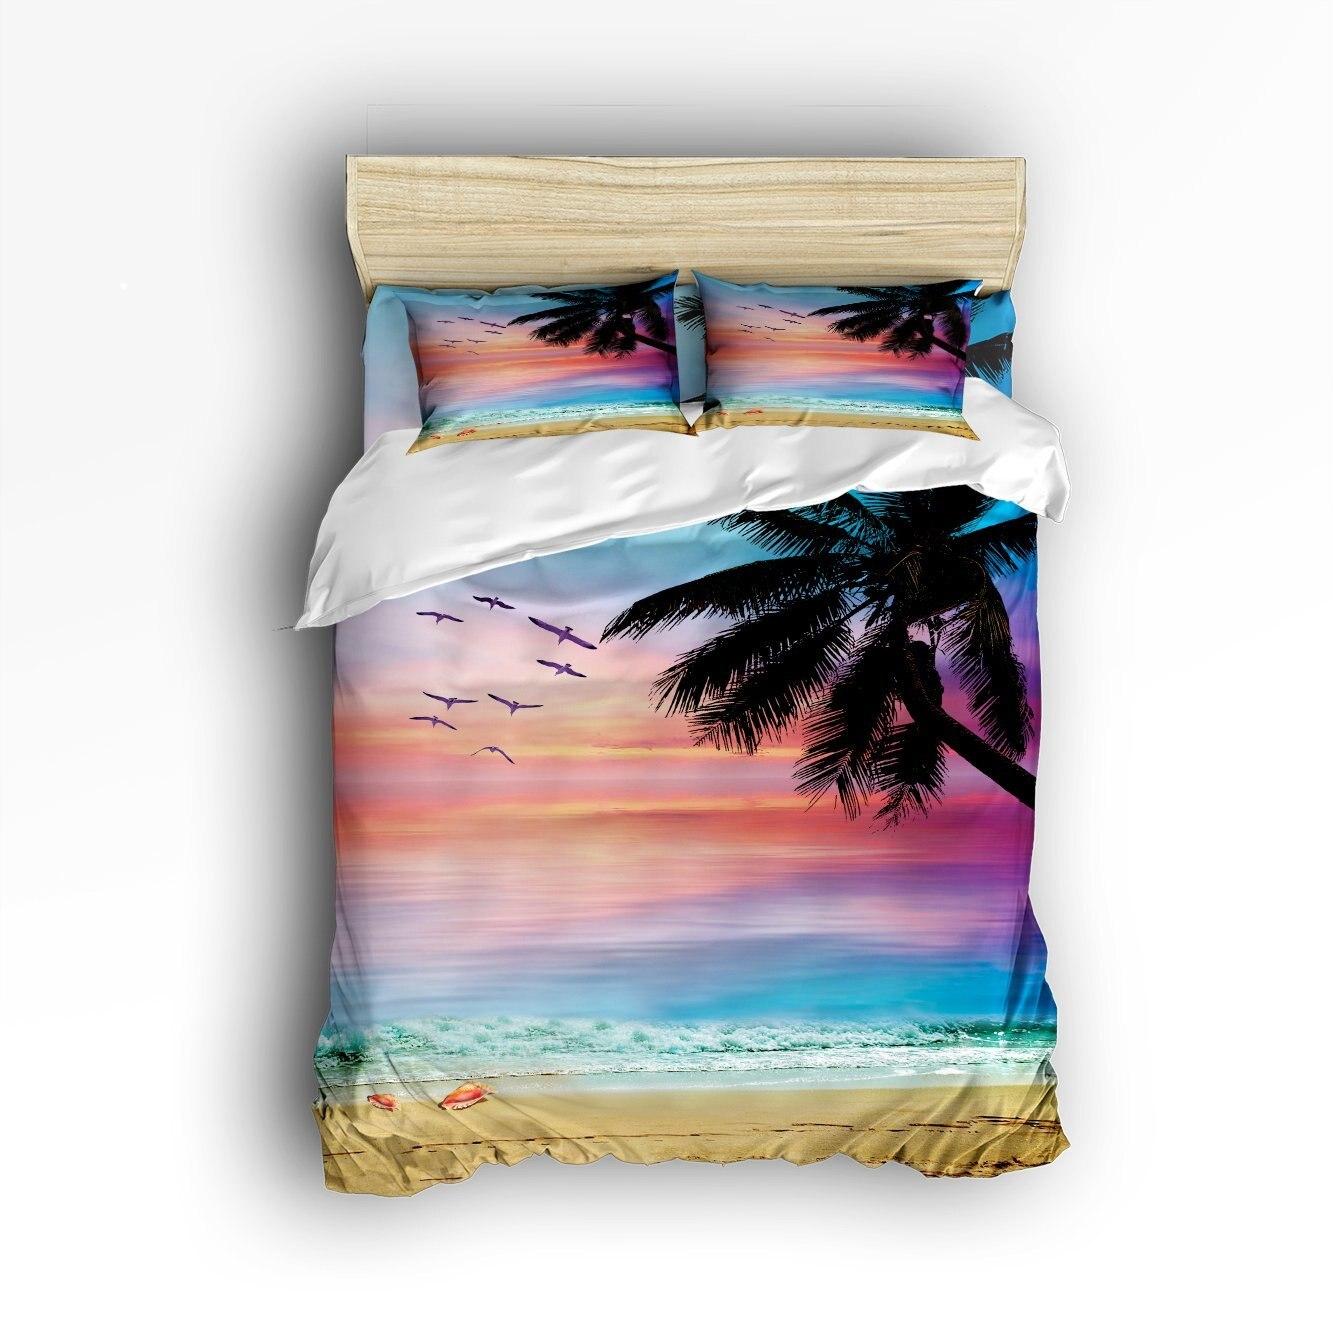 Queen Size Bedding Set- Coconut Trees Tropical Beach Sunset Duvet Cover Set Bedspread For Children/Kids/Teens/Adults, 4 Piece